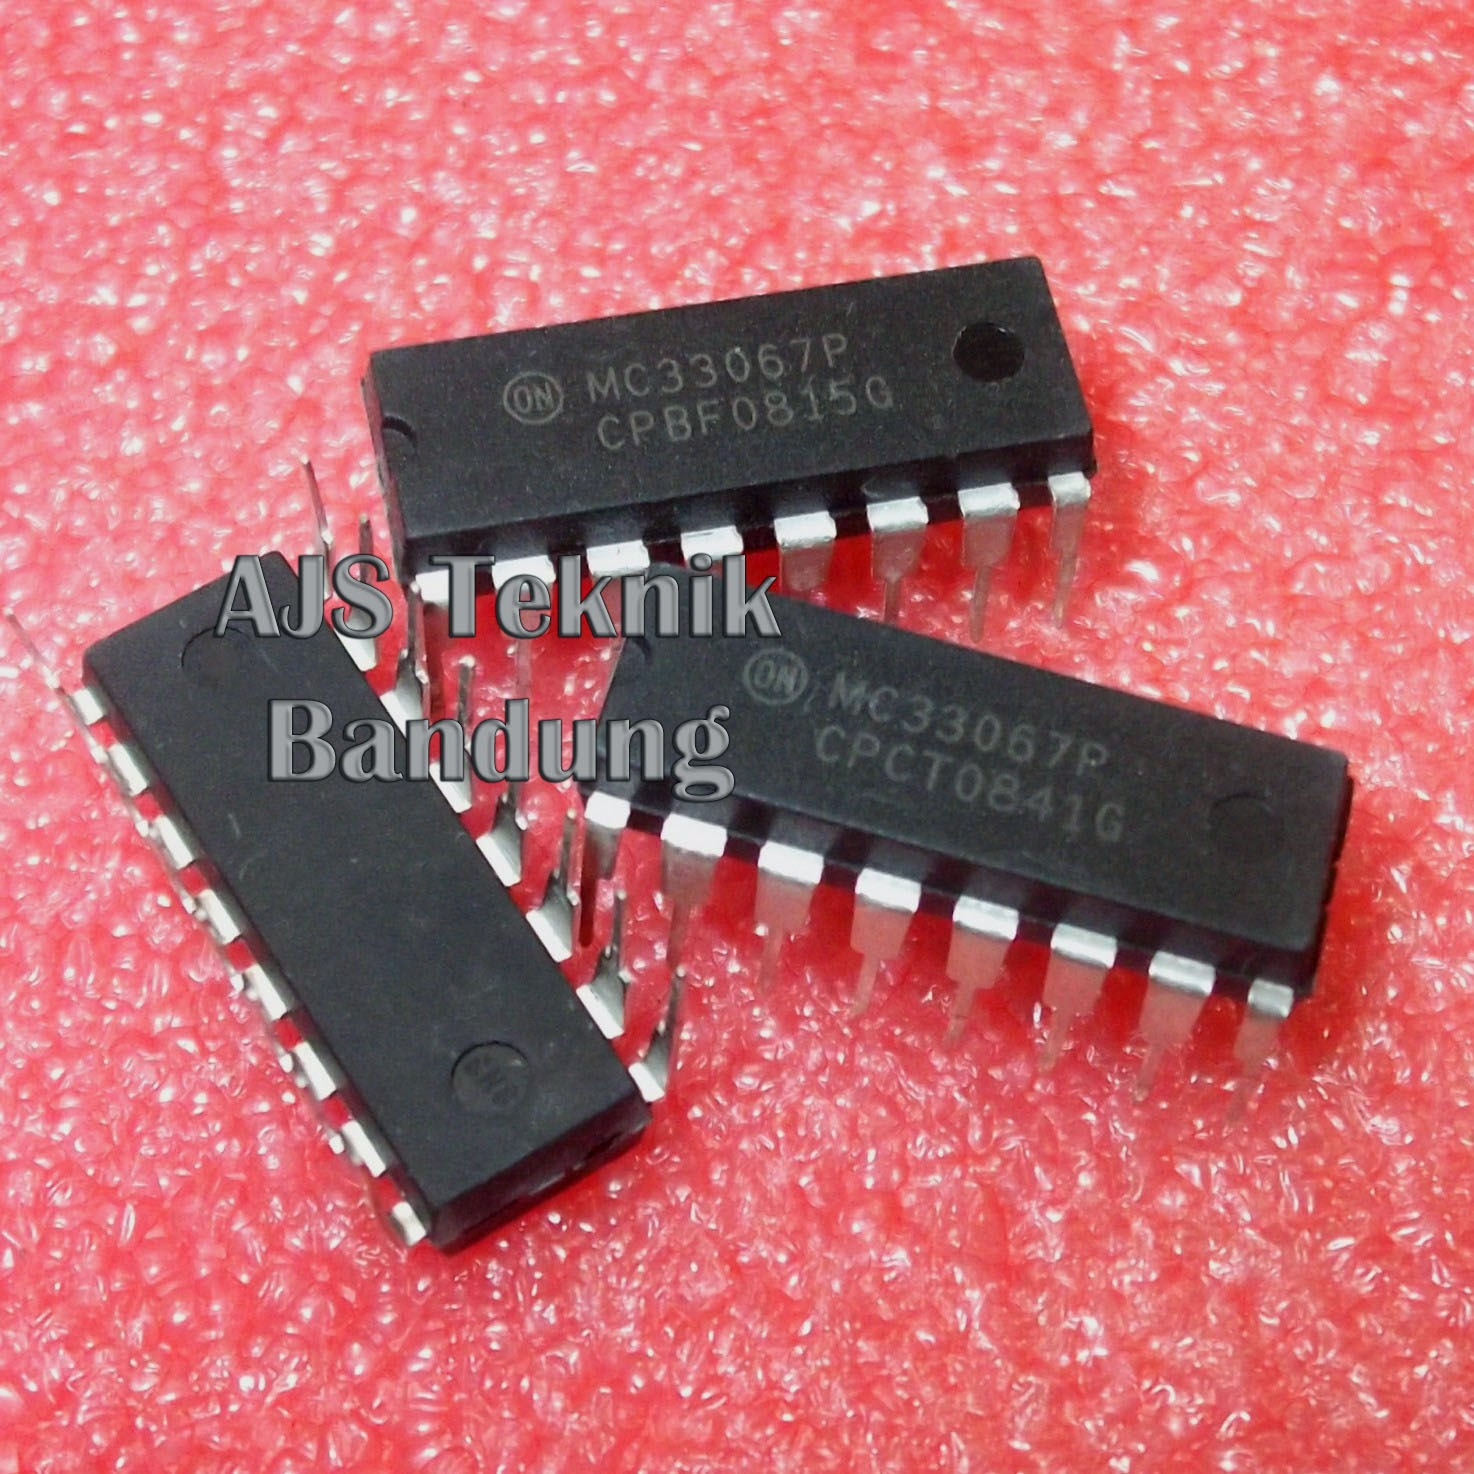 IC MC33067P